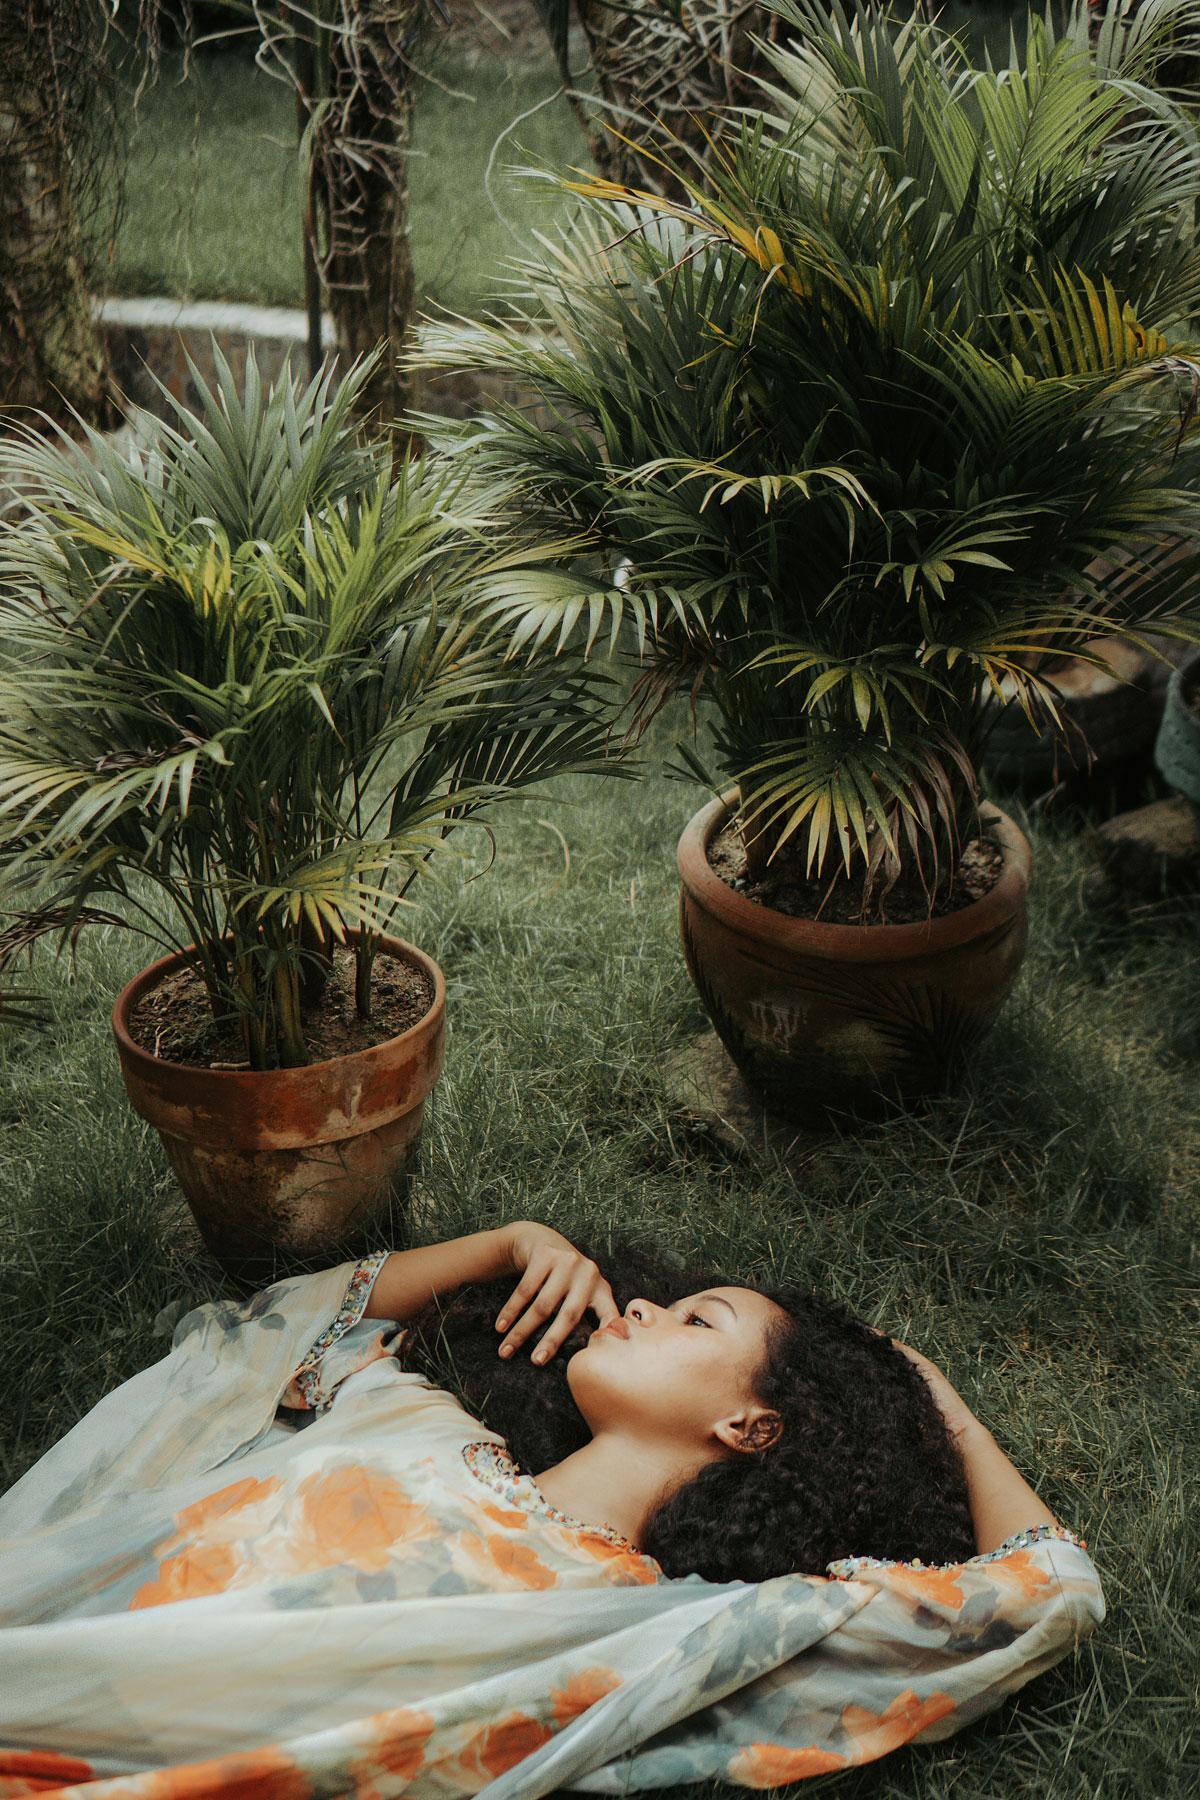 palmier nain en pot